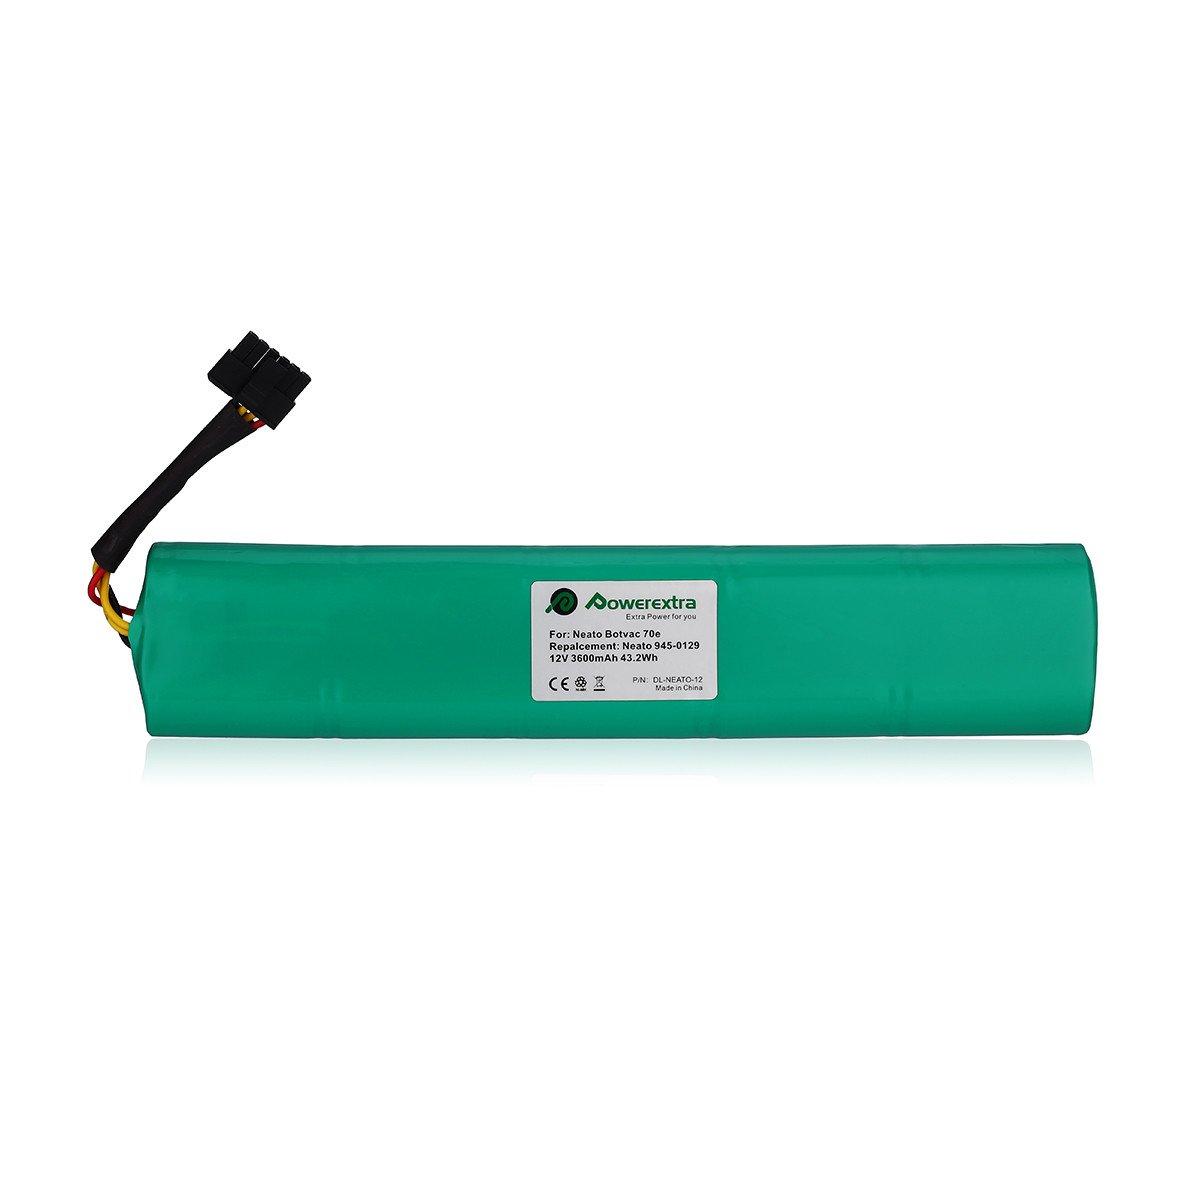 Botvac D85 205-0012 3600mAh 12V Batterie pour Neato Botvac D7500